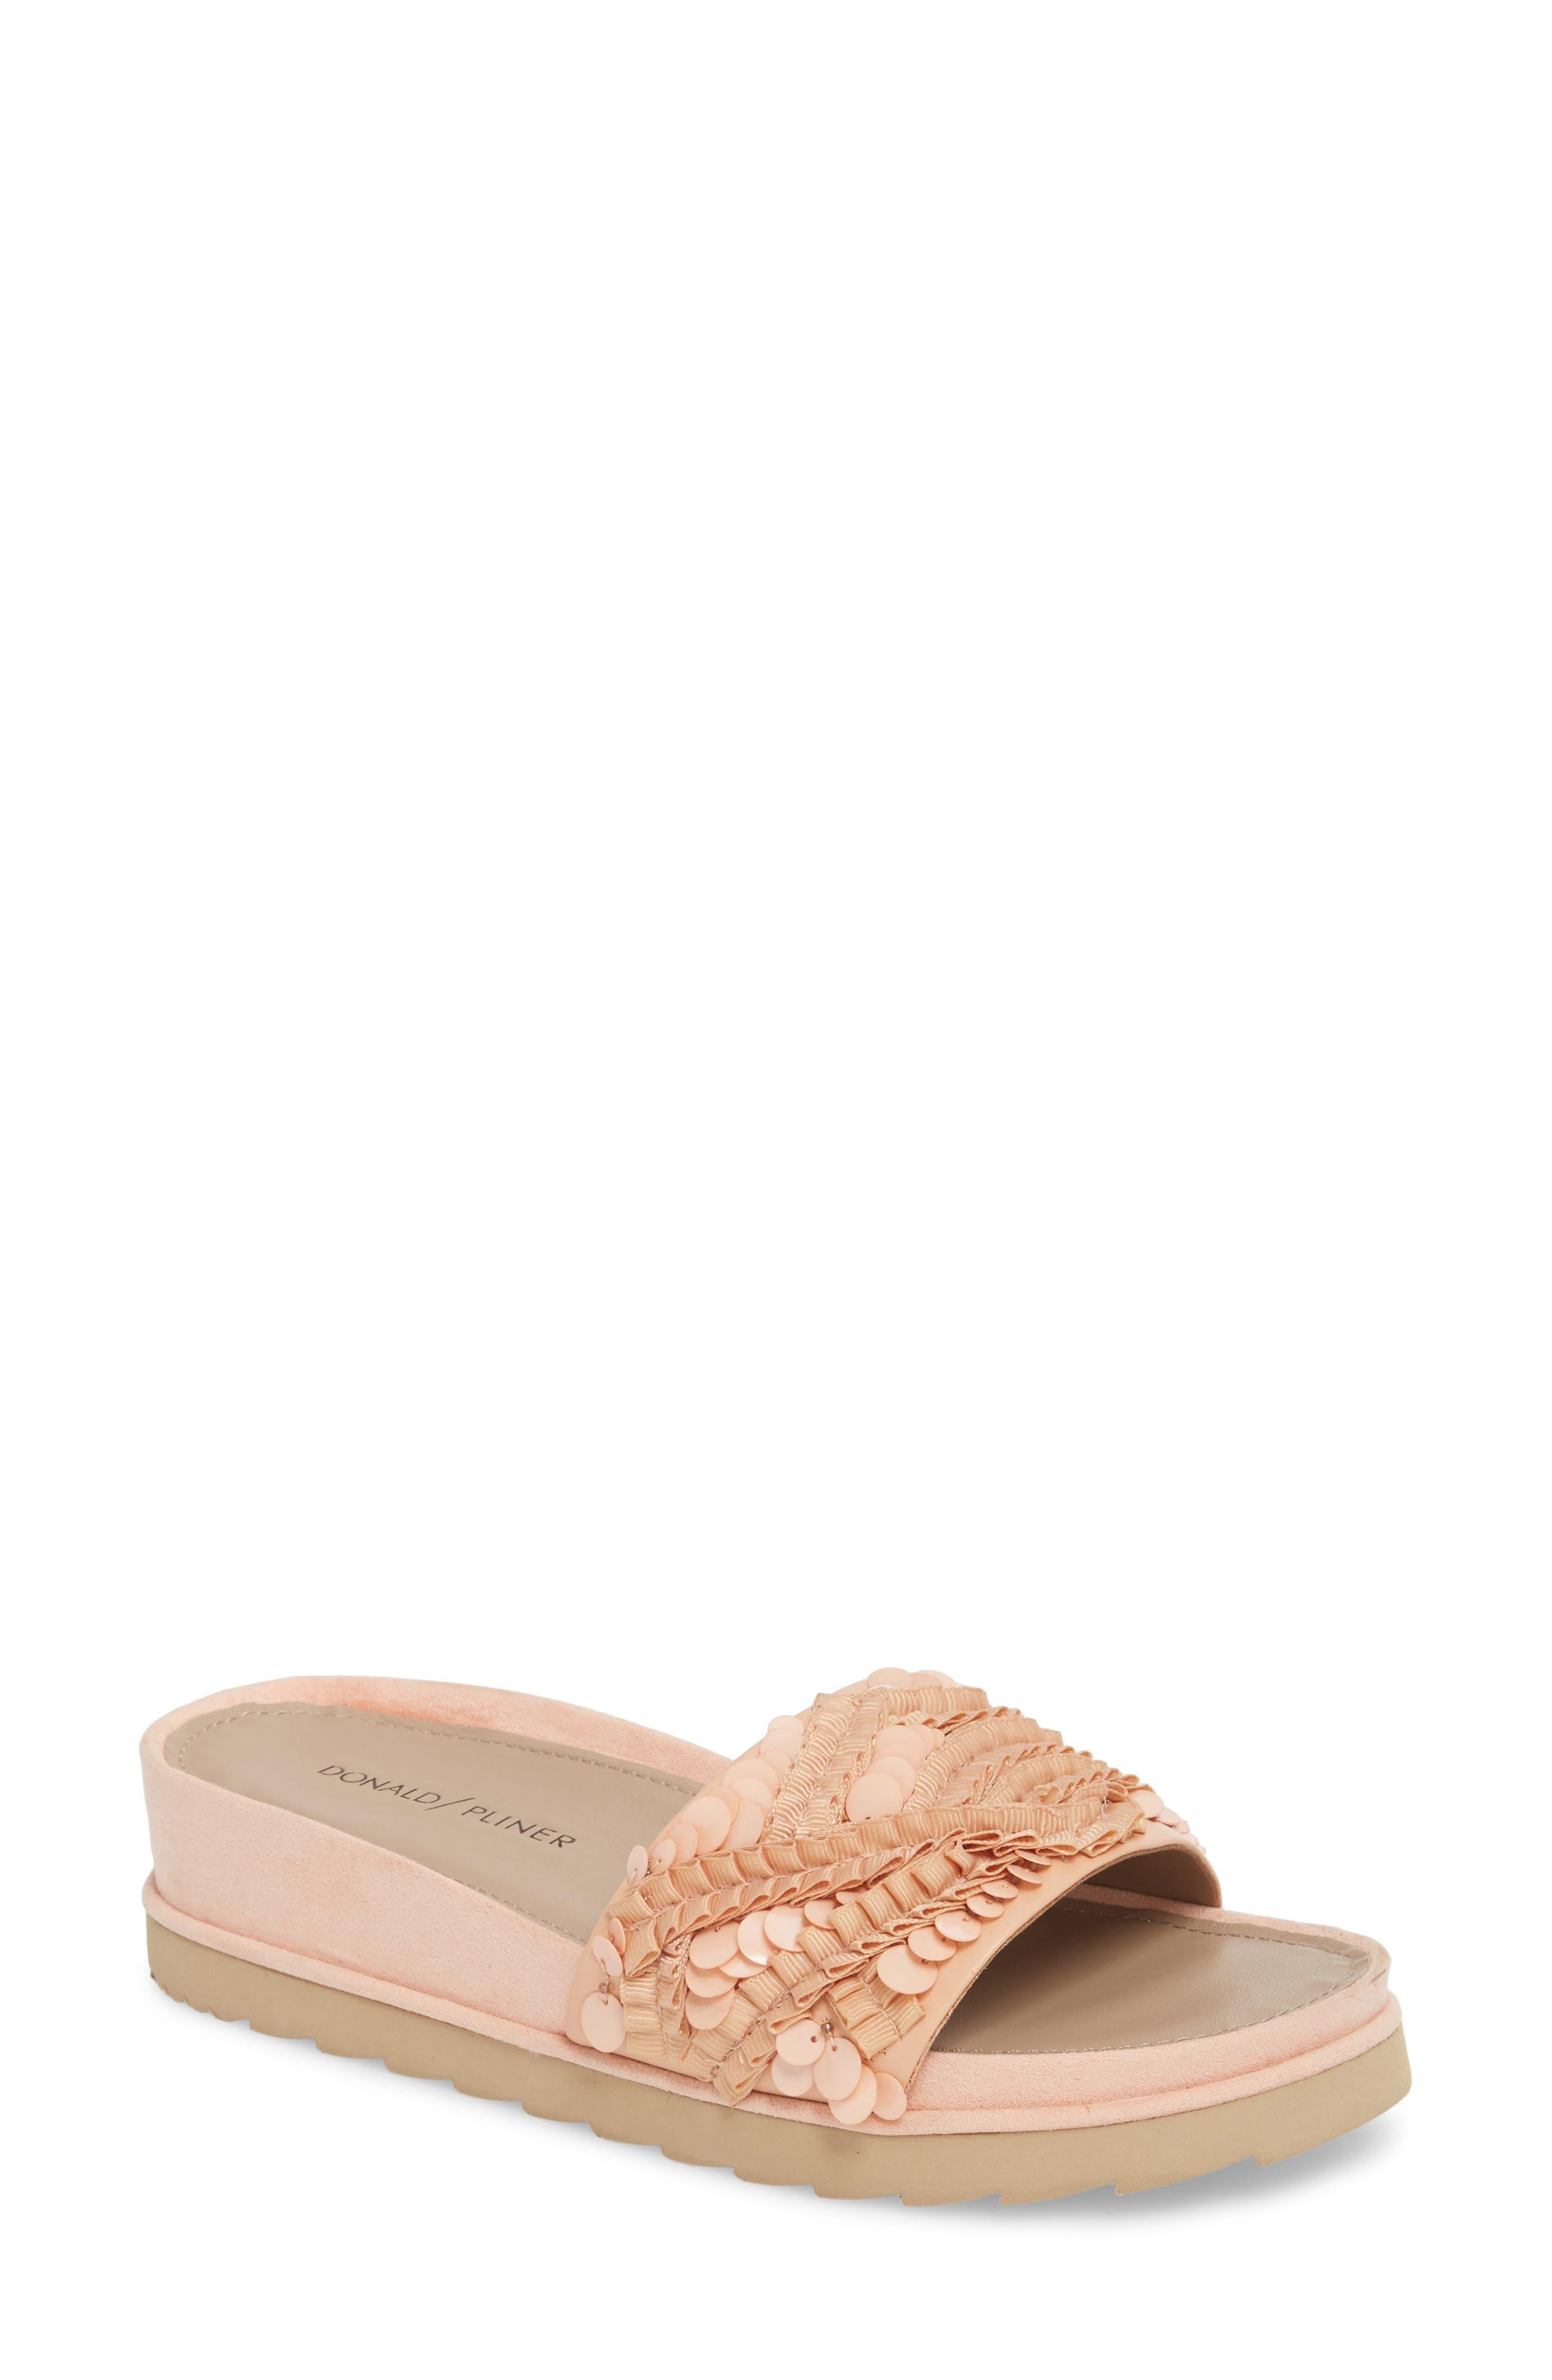 Cava Slide Sandal,                         Main,                         color, Peony Leather